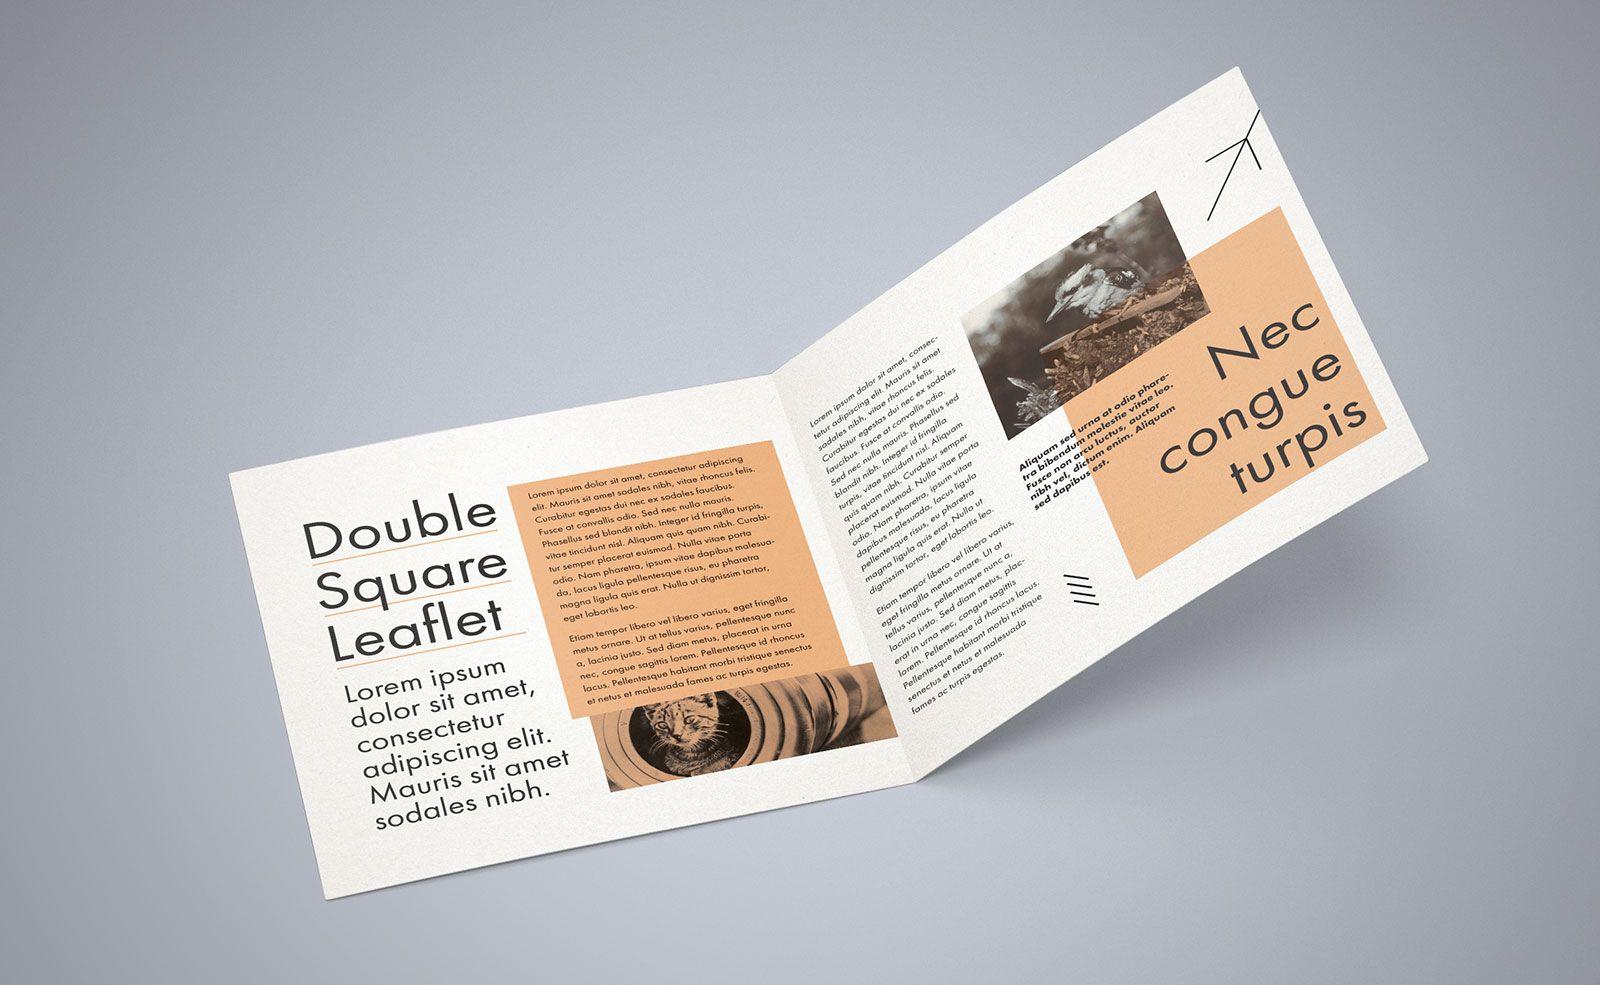 Free Square Bi Fold Brochure Mockup Psd File 2 | Bi Fold Throughout 2 Fold Brochure Template Free